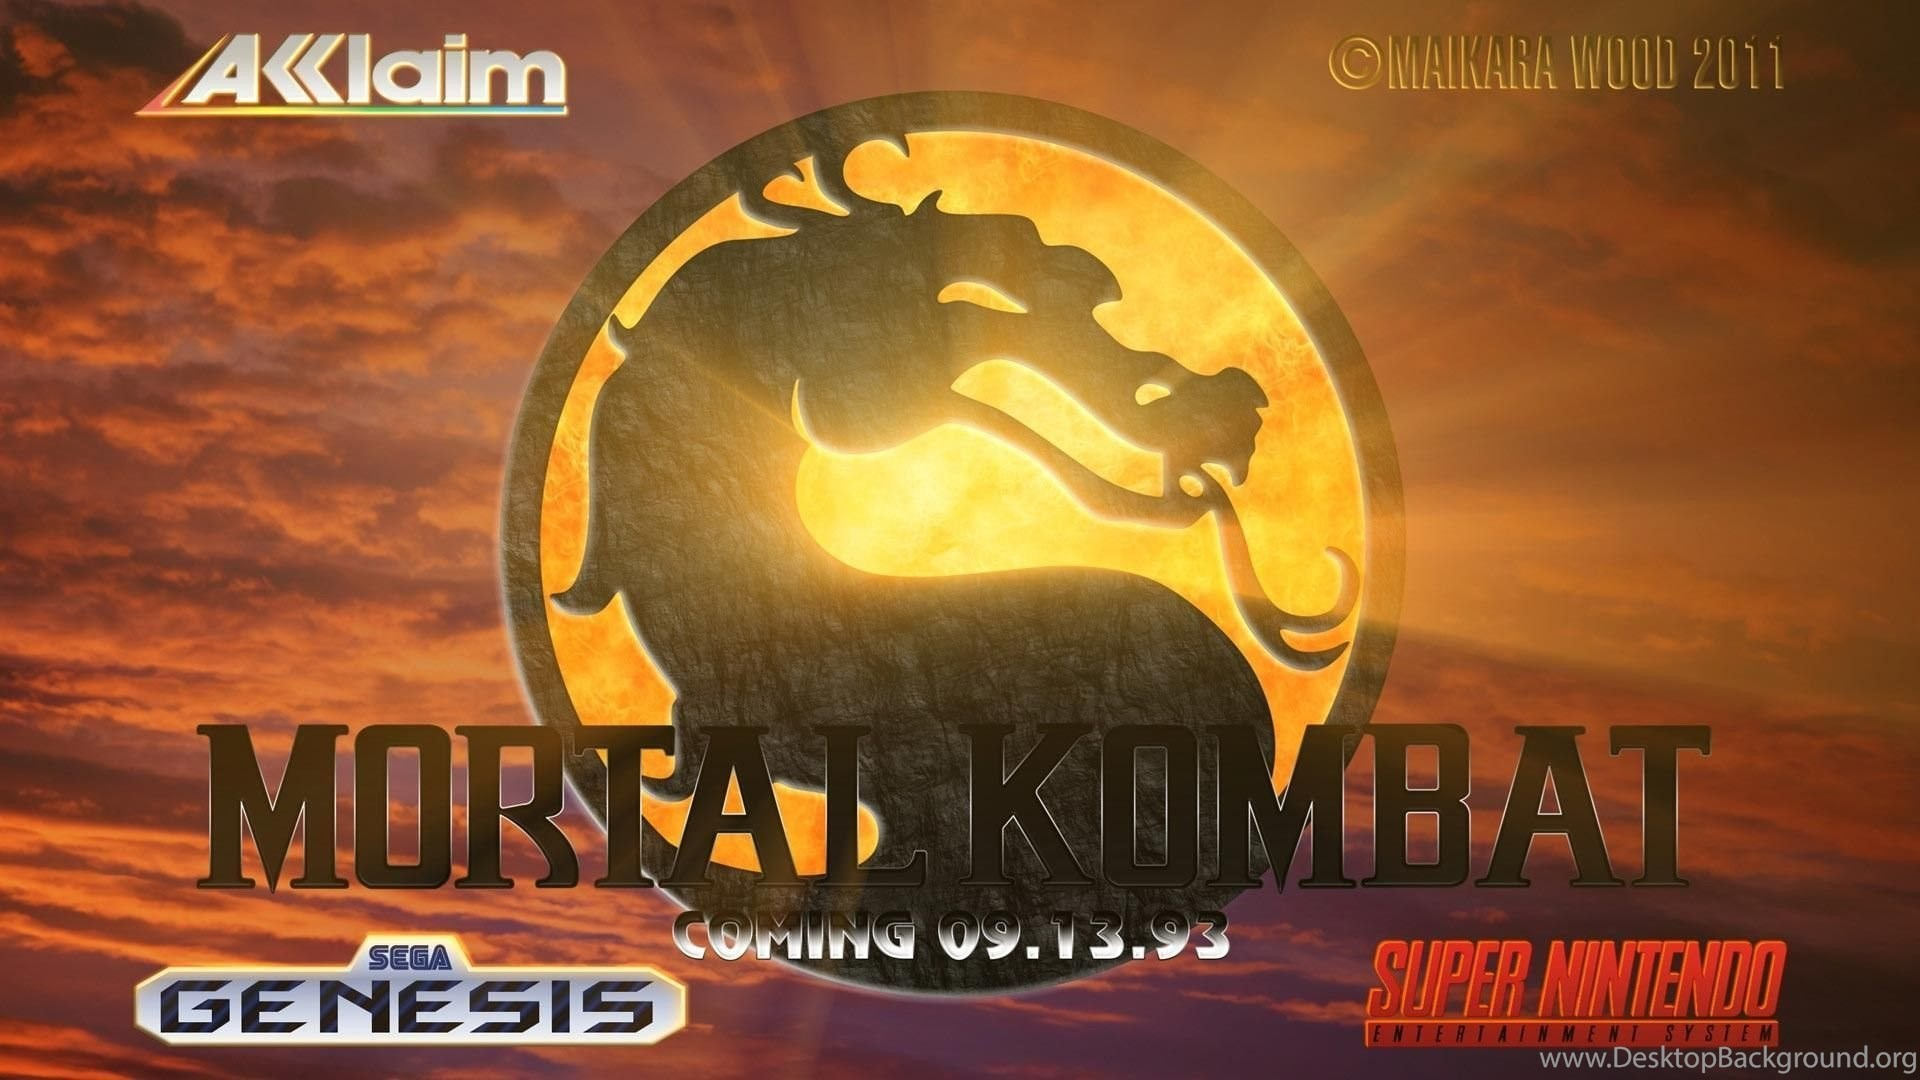 Mortal Kombat Ermac Wallpapers Widescreen Related Desktop